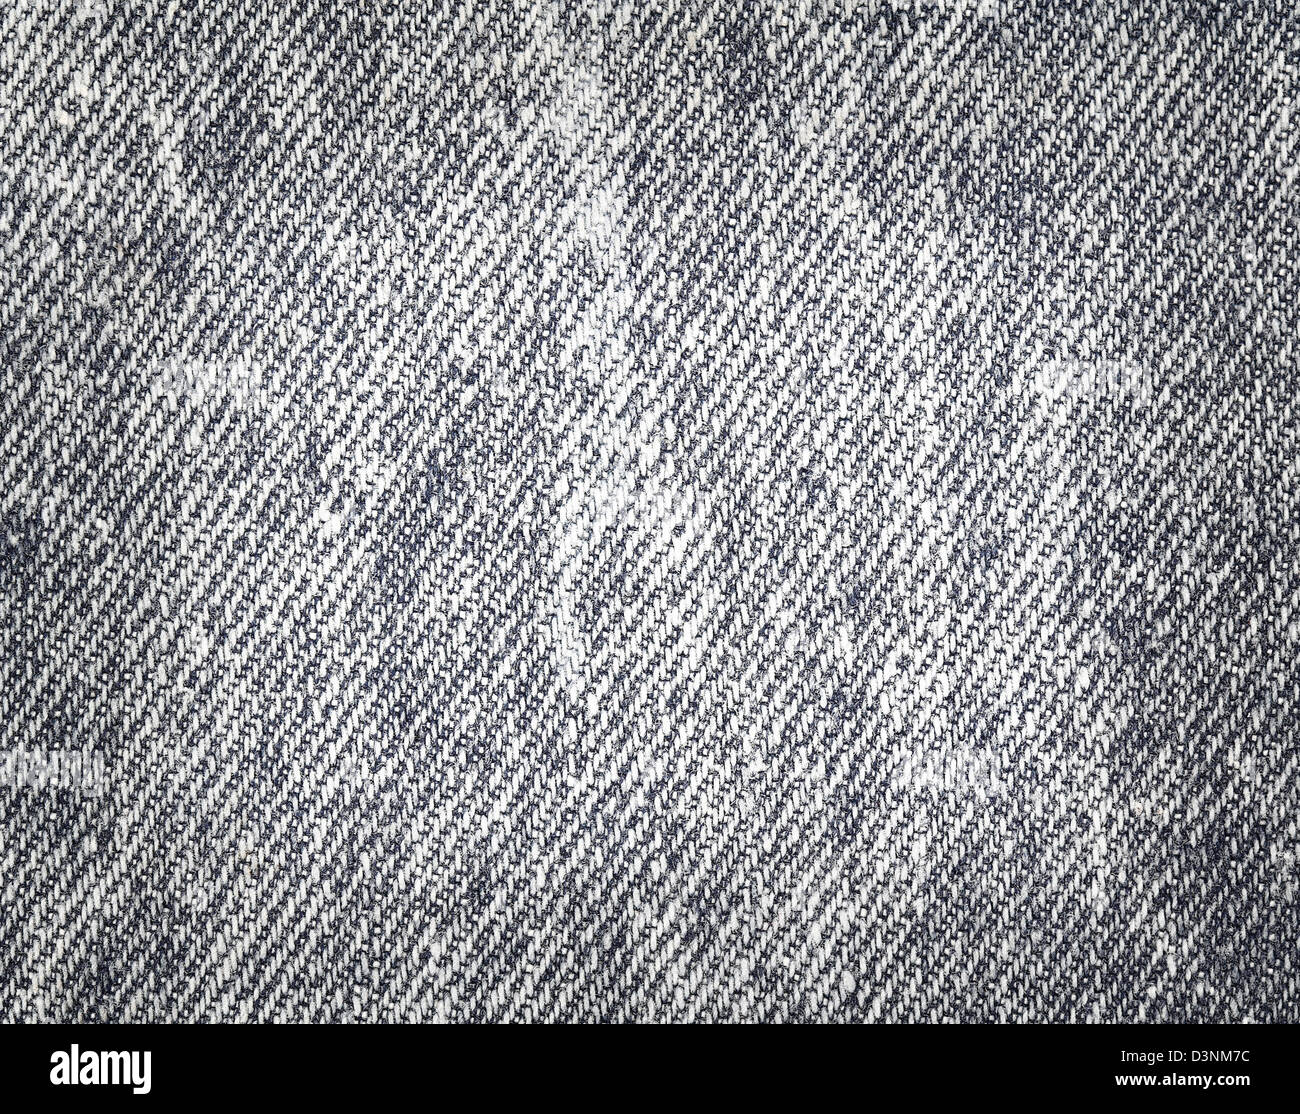 Texture jeans Photo Stock